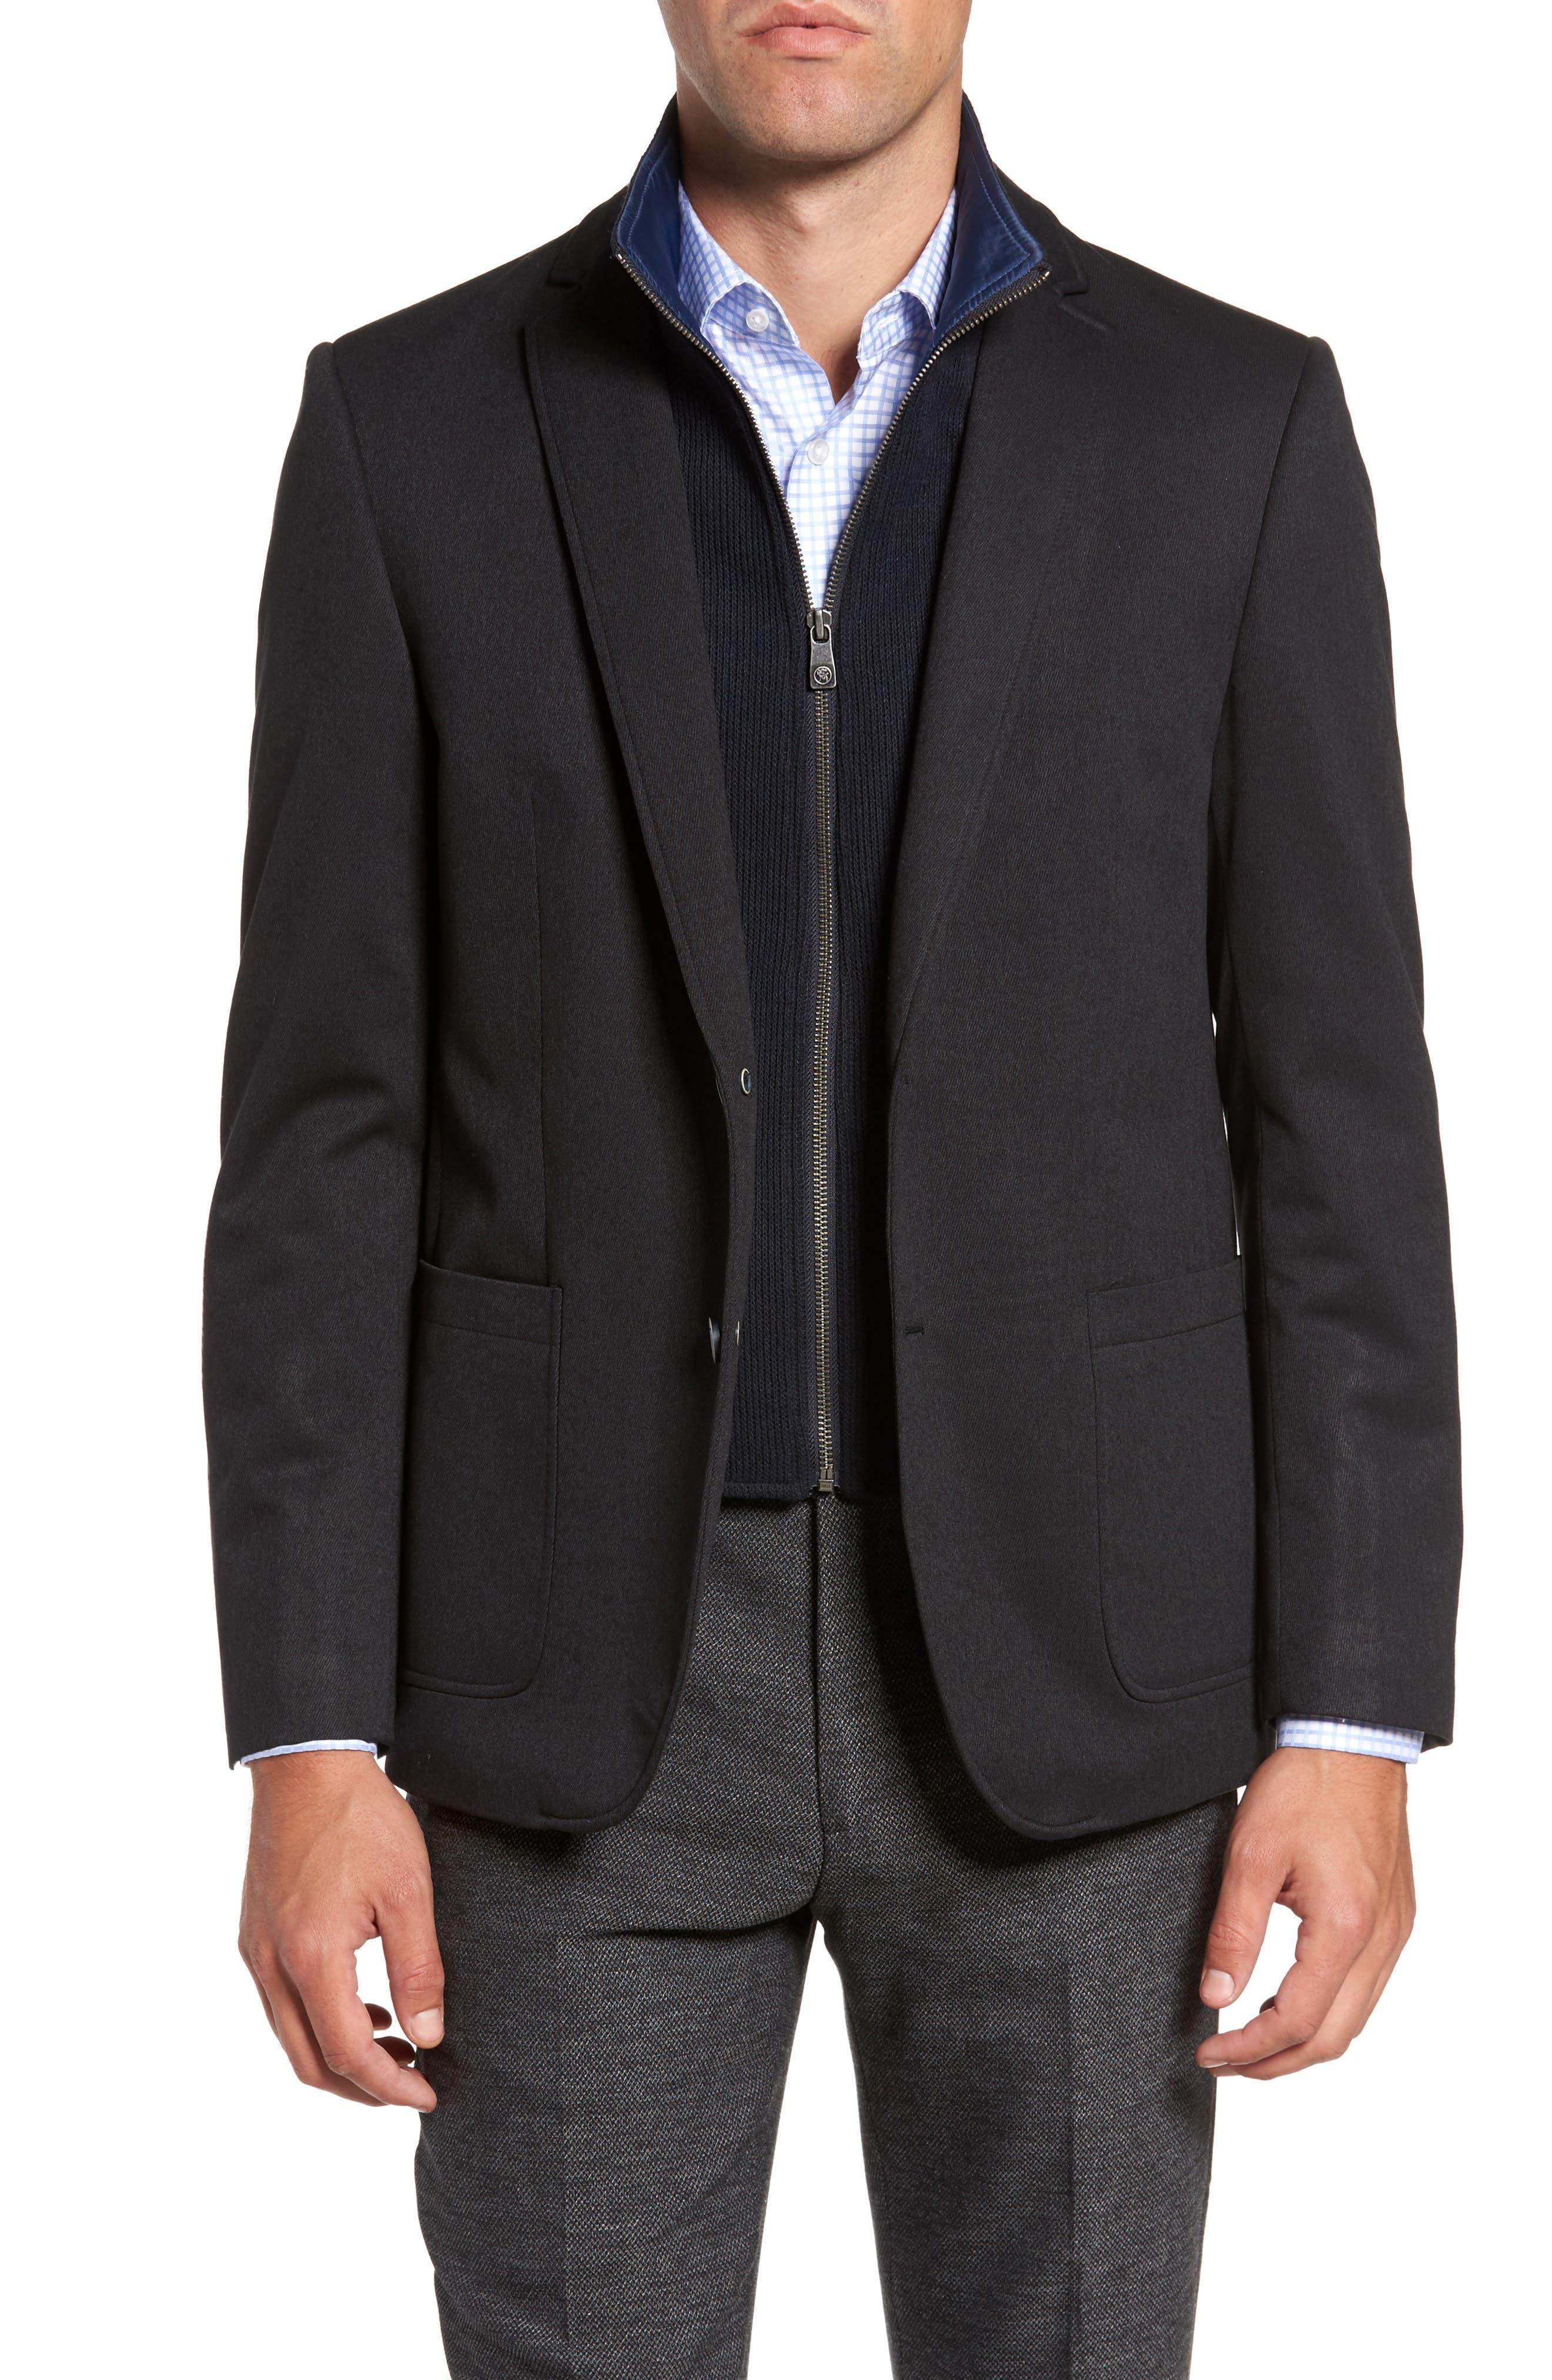 Hart Schaffner Marx Broderick Technical Outerwear Jacket with Detachable Knit Bib